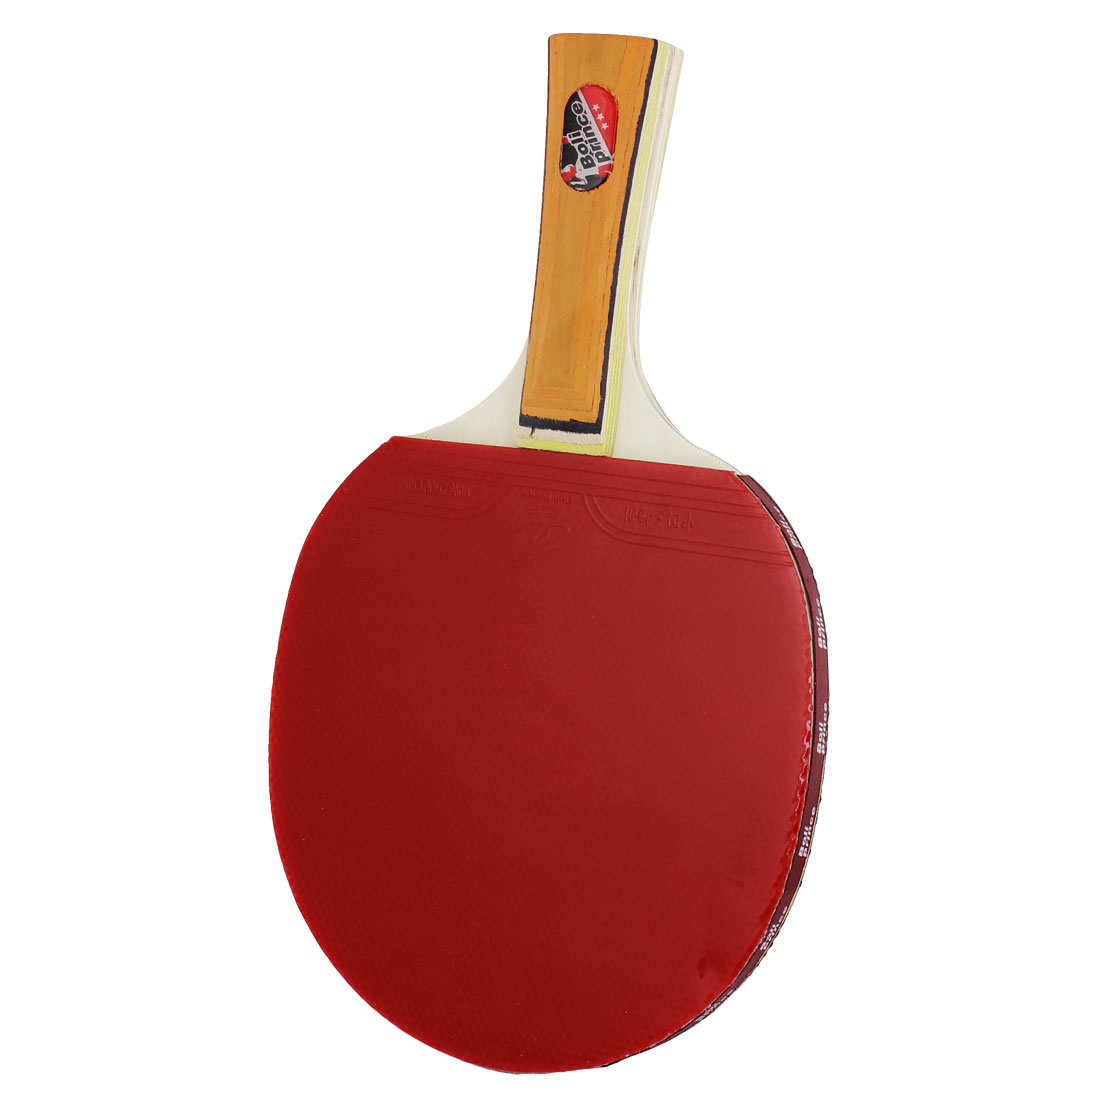 Shakehand Orange Handle Black Red Double Side Ping Pong Recreational Table Tennis Racket